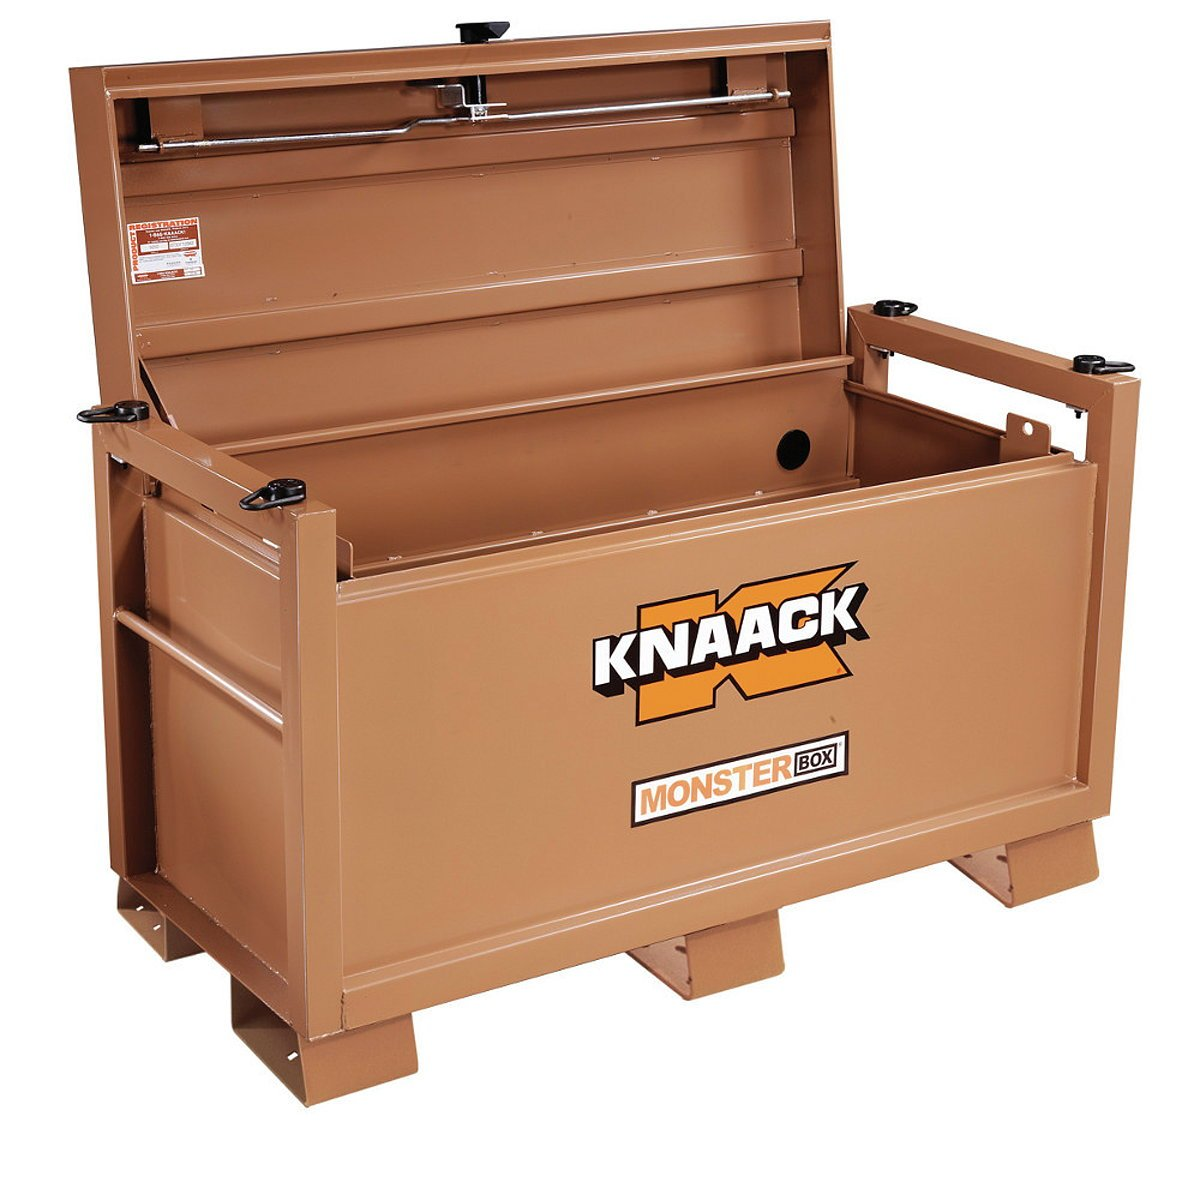 Amazon.com: knaack 1010 Monster caja de herramientas, 31 cu ...